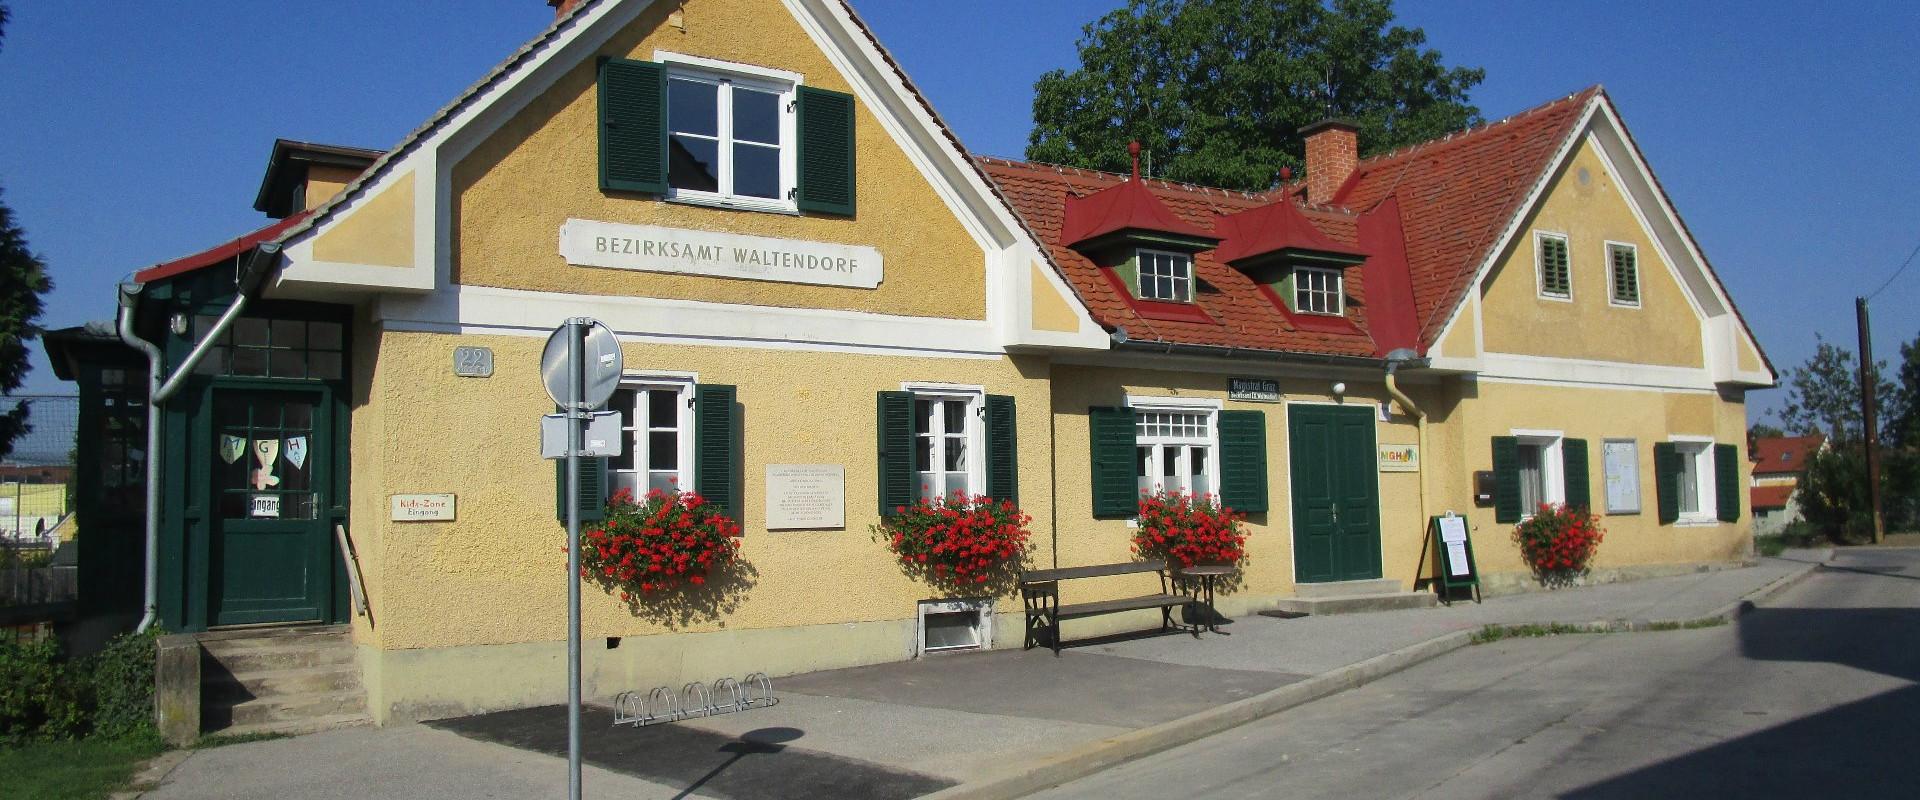 Bezirksamt Graz Waltendorf